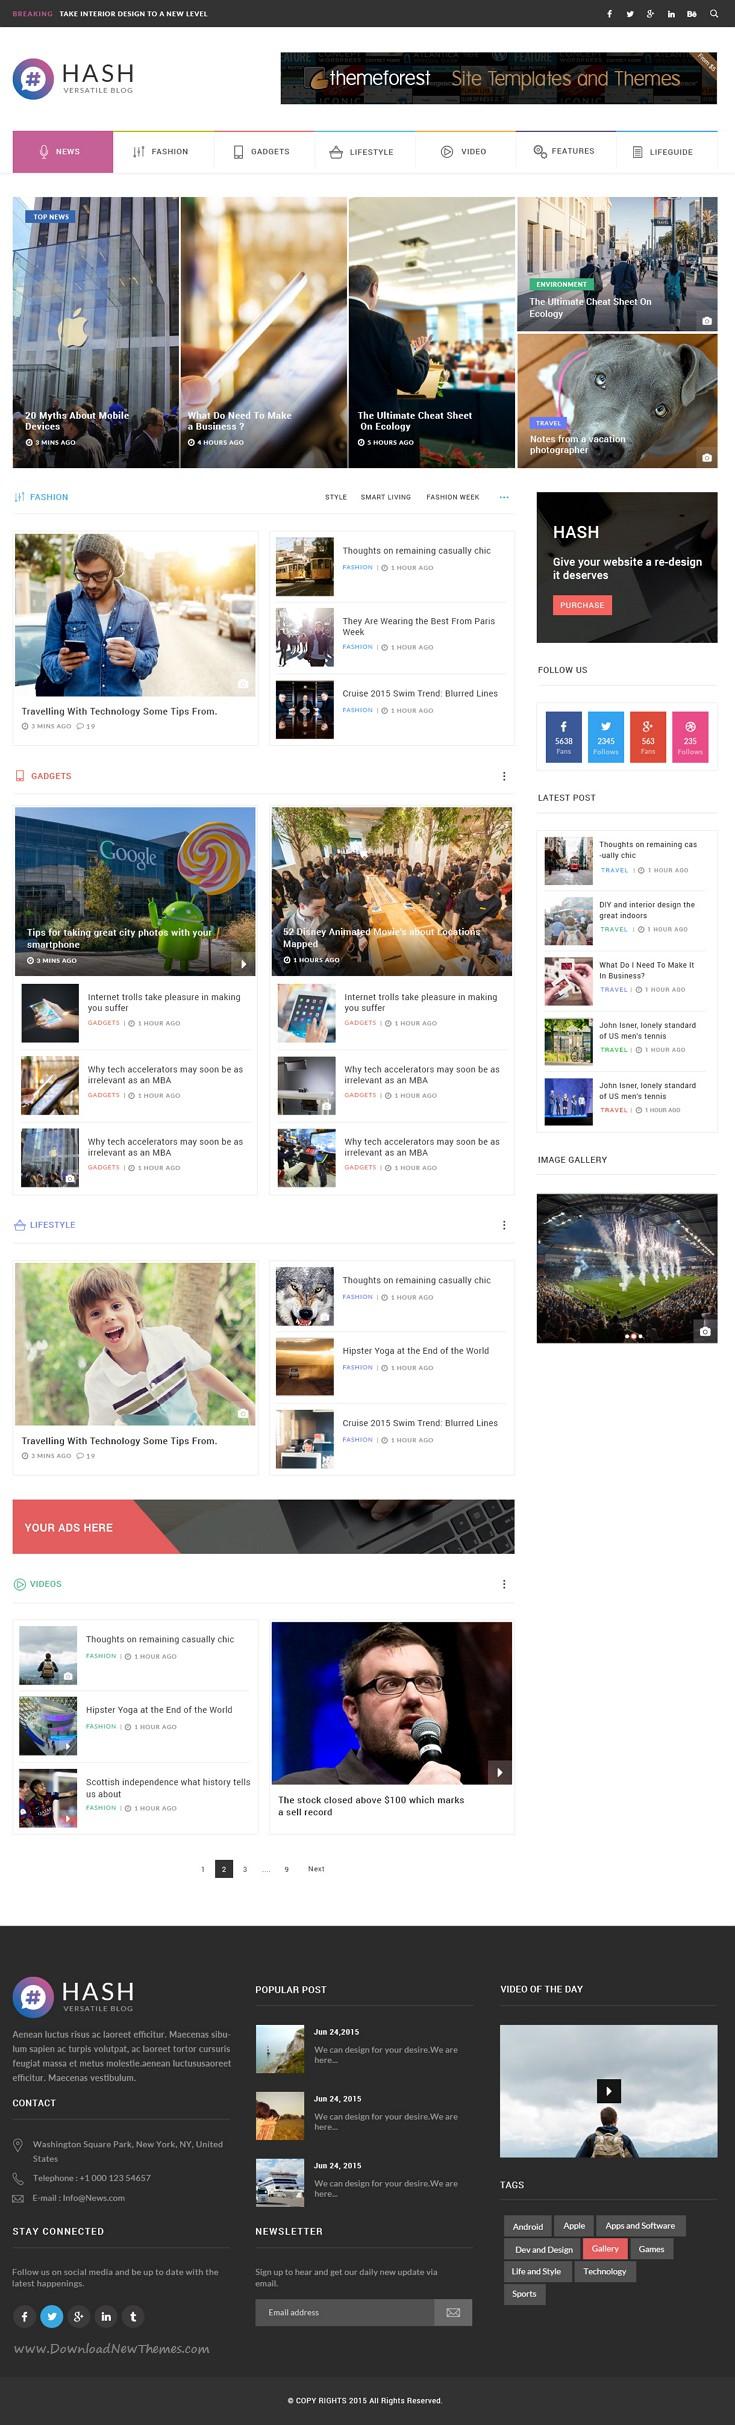 Hash News Magazine Psd Template News Web Design Web Layout Design Web Design